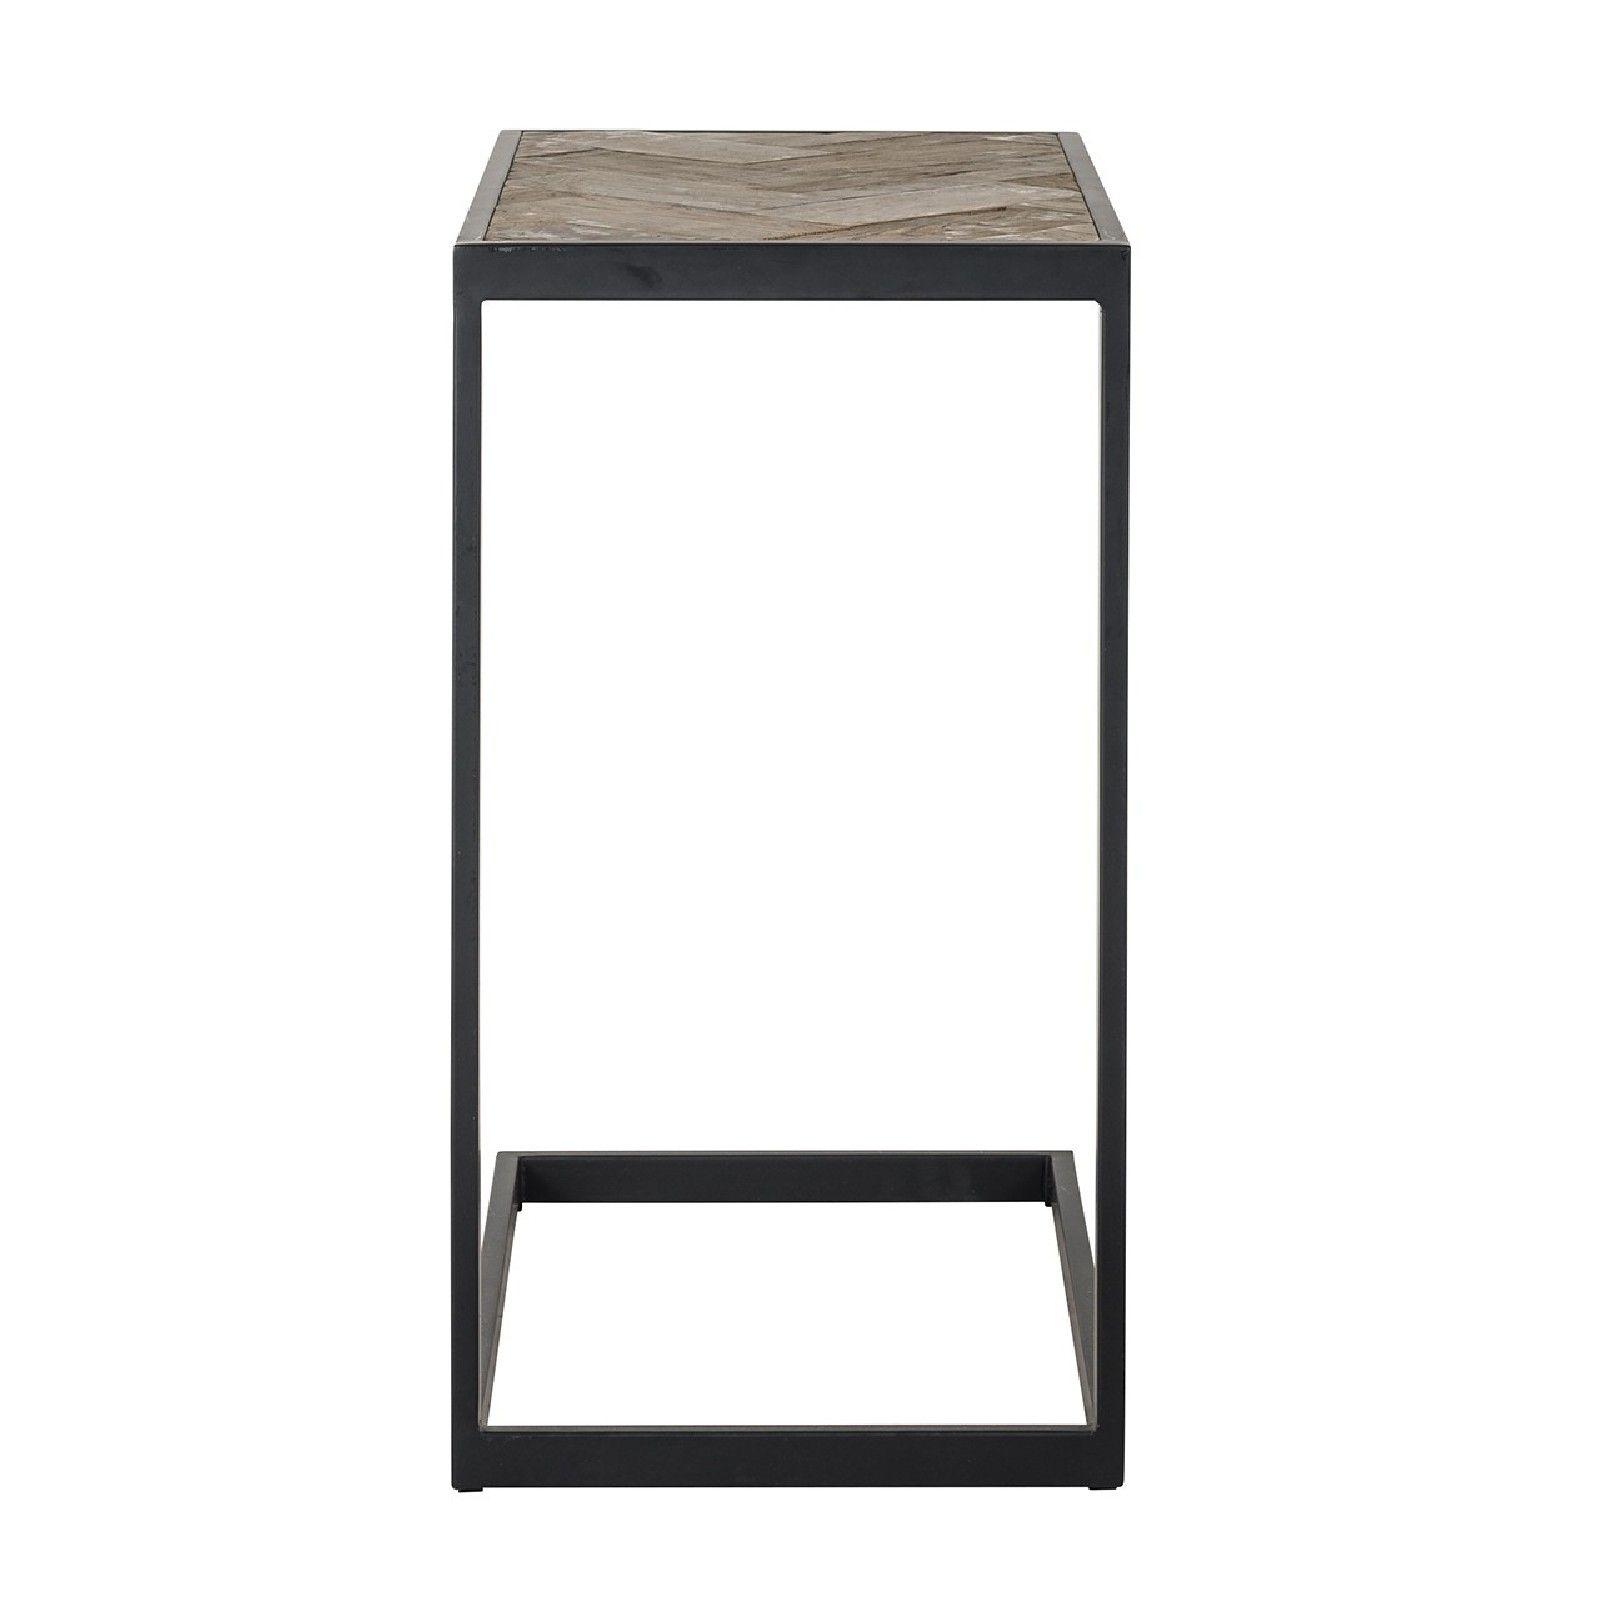 Table d'appoint Herringbone Meuble Déco Tendance - 583